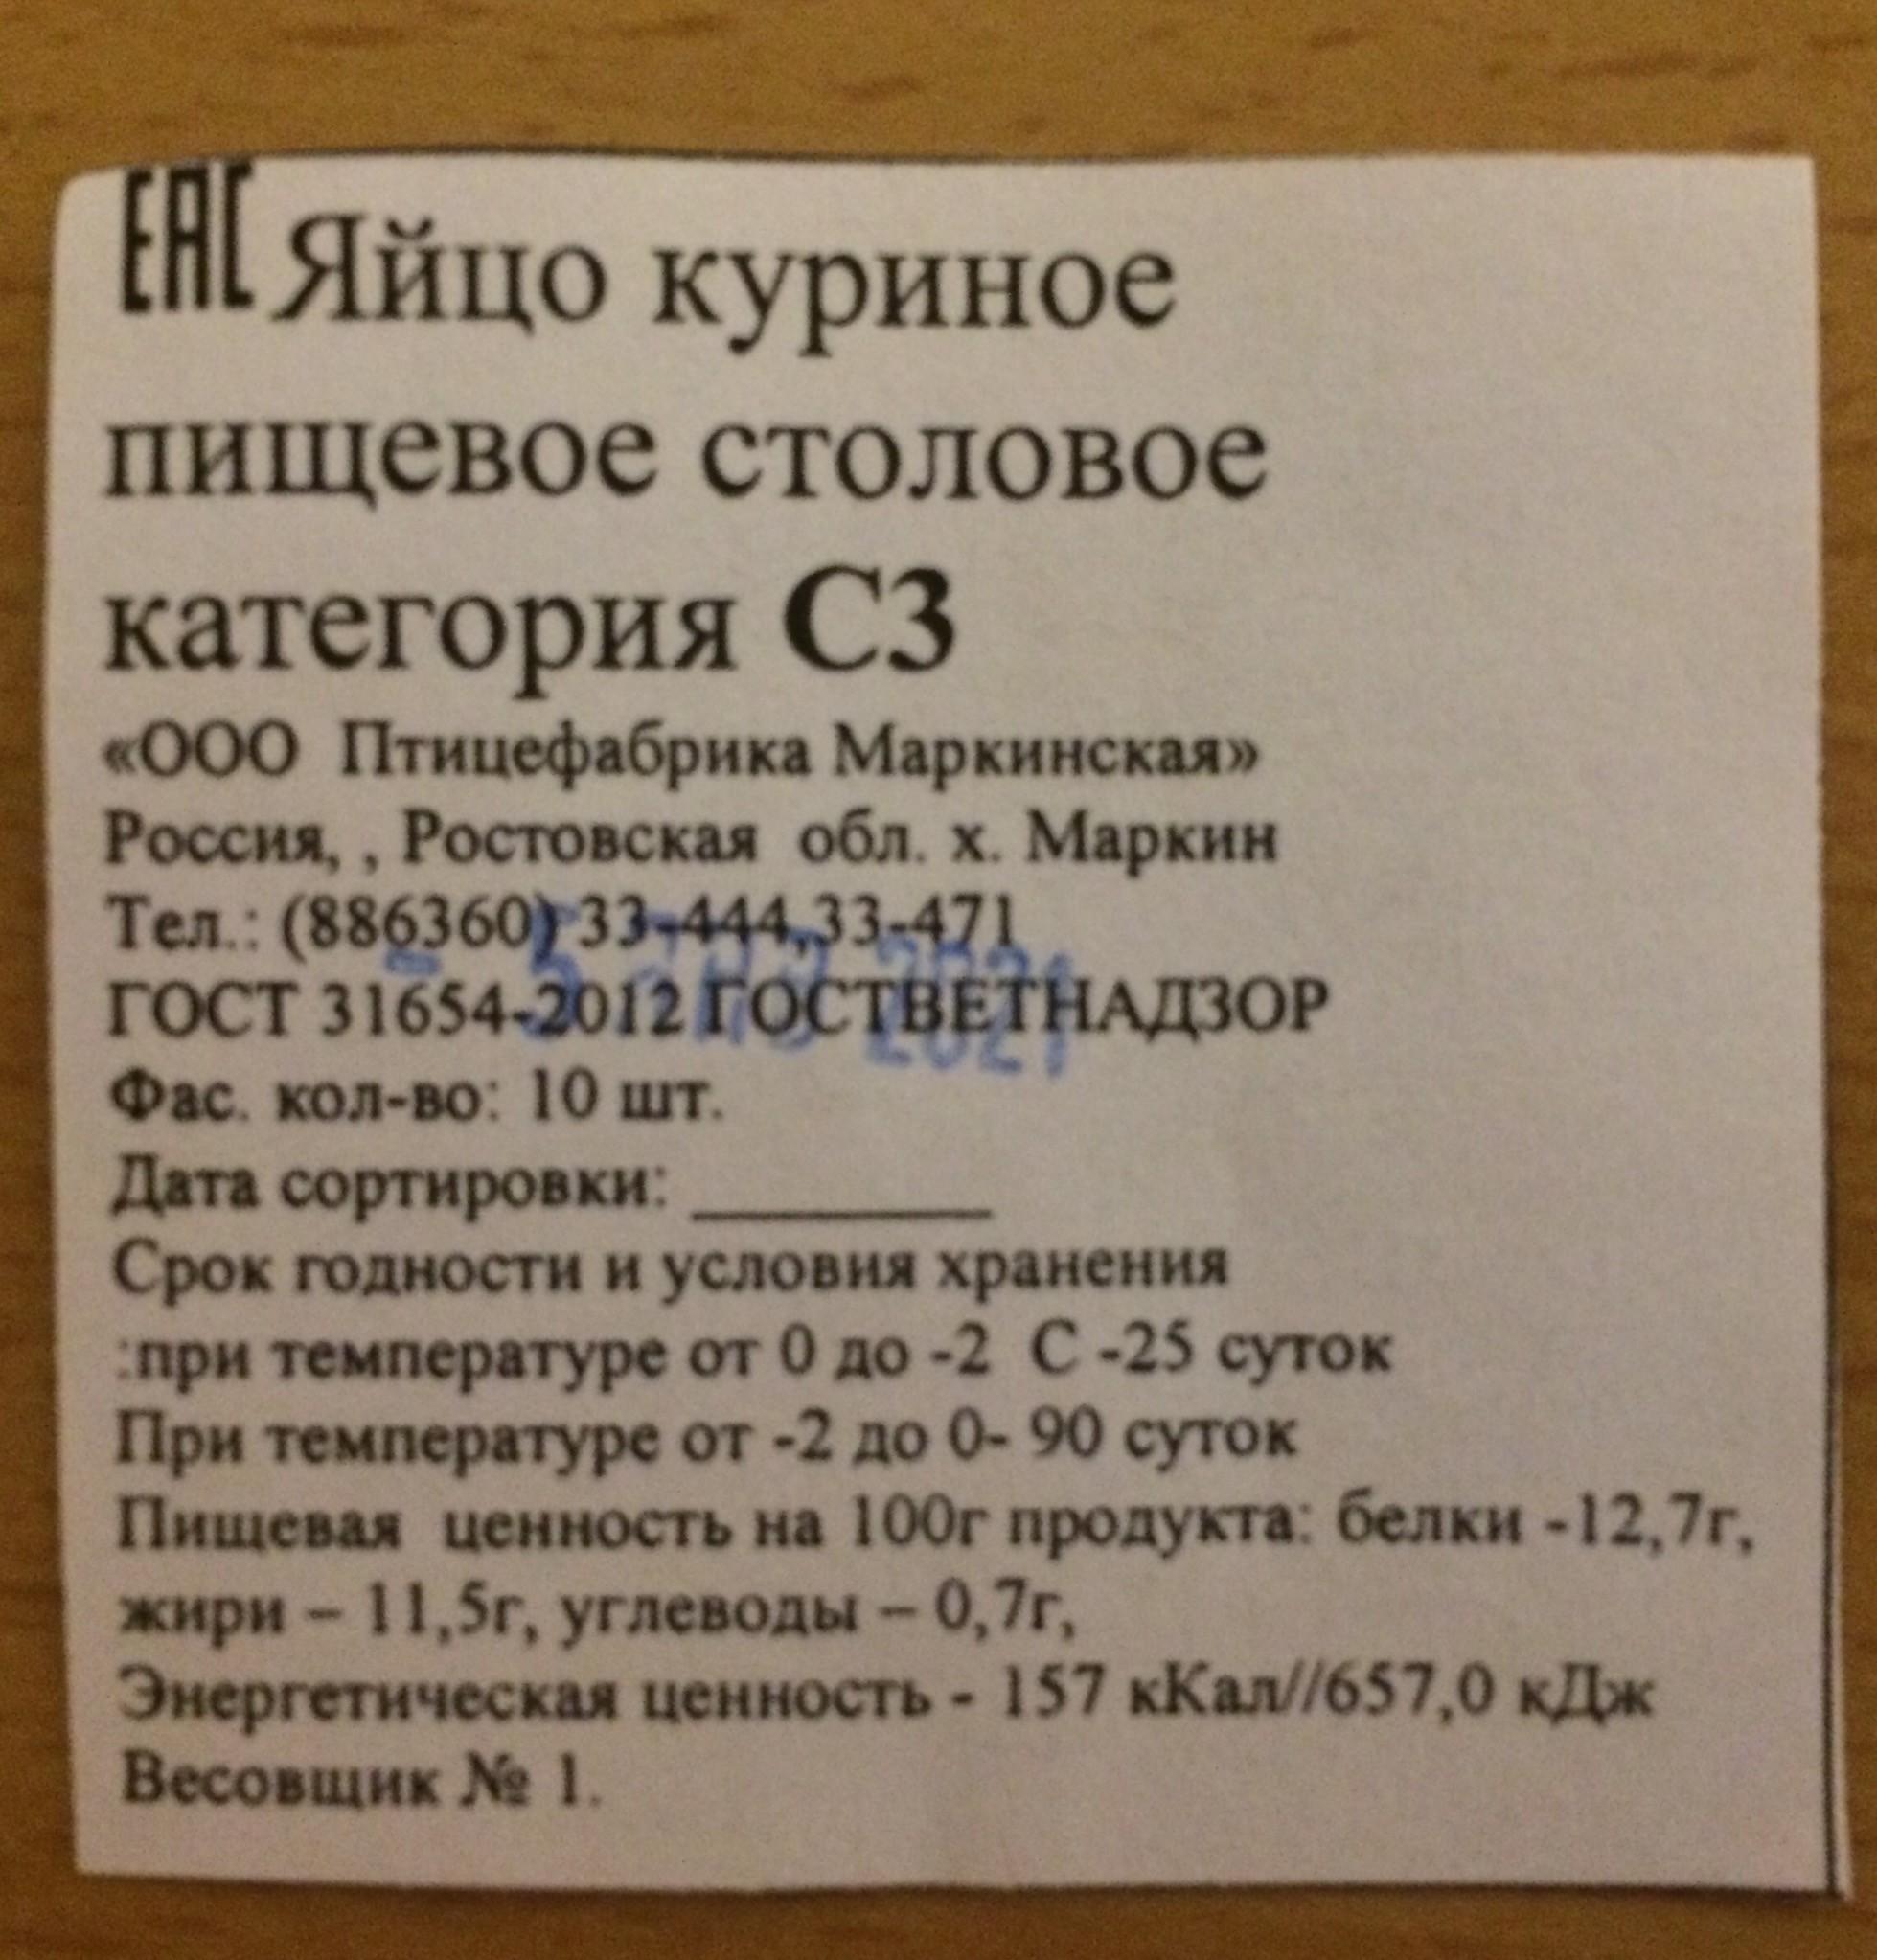 A421F002-A755-4115-9A41-D805DE190E69.jpeg